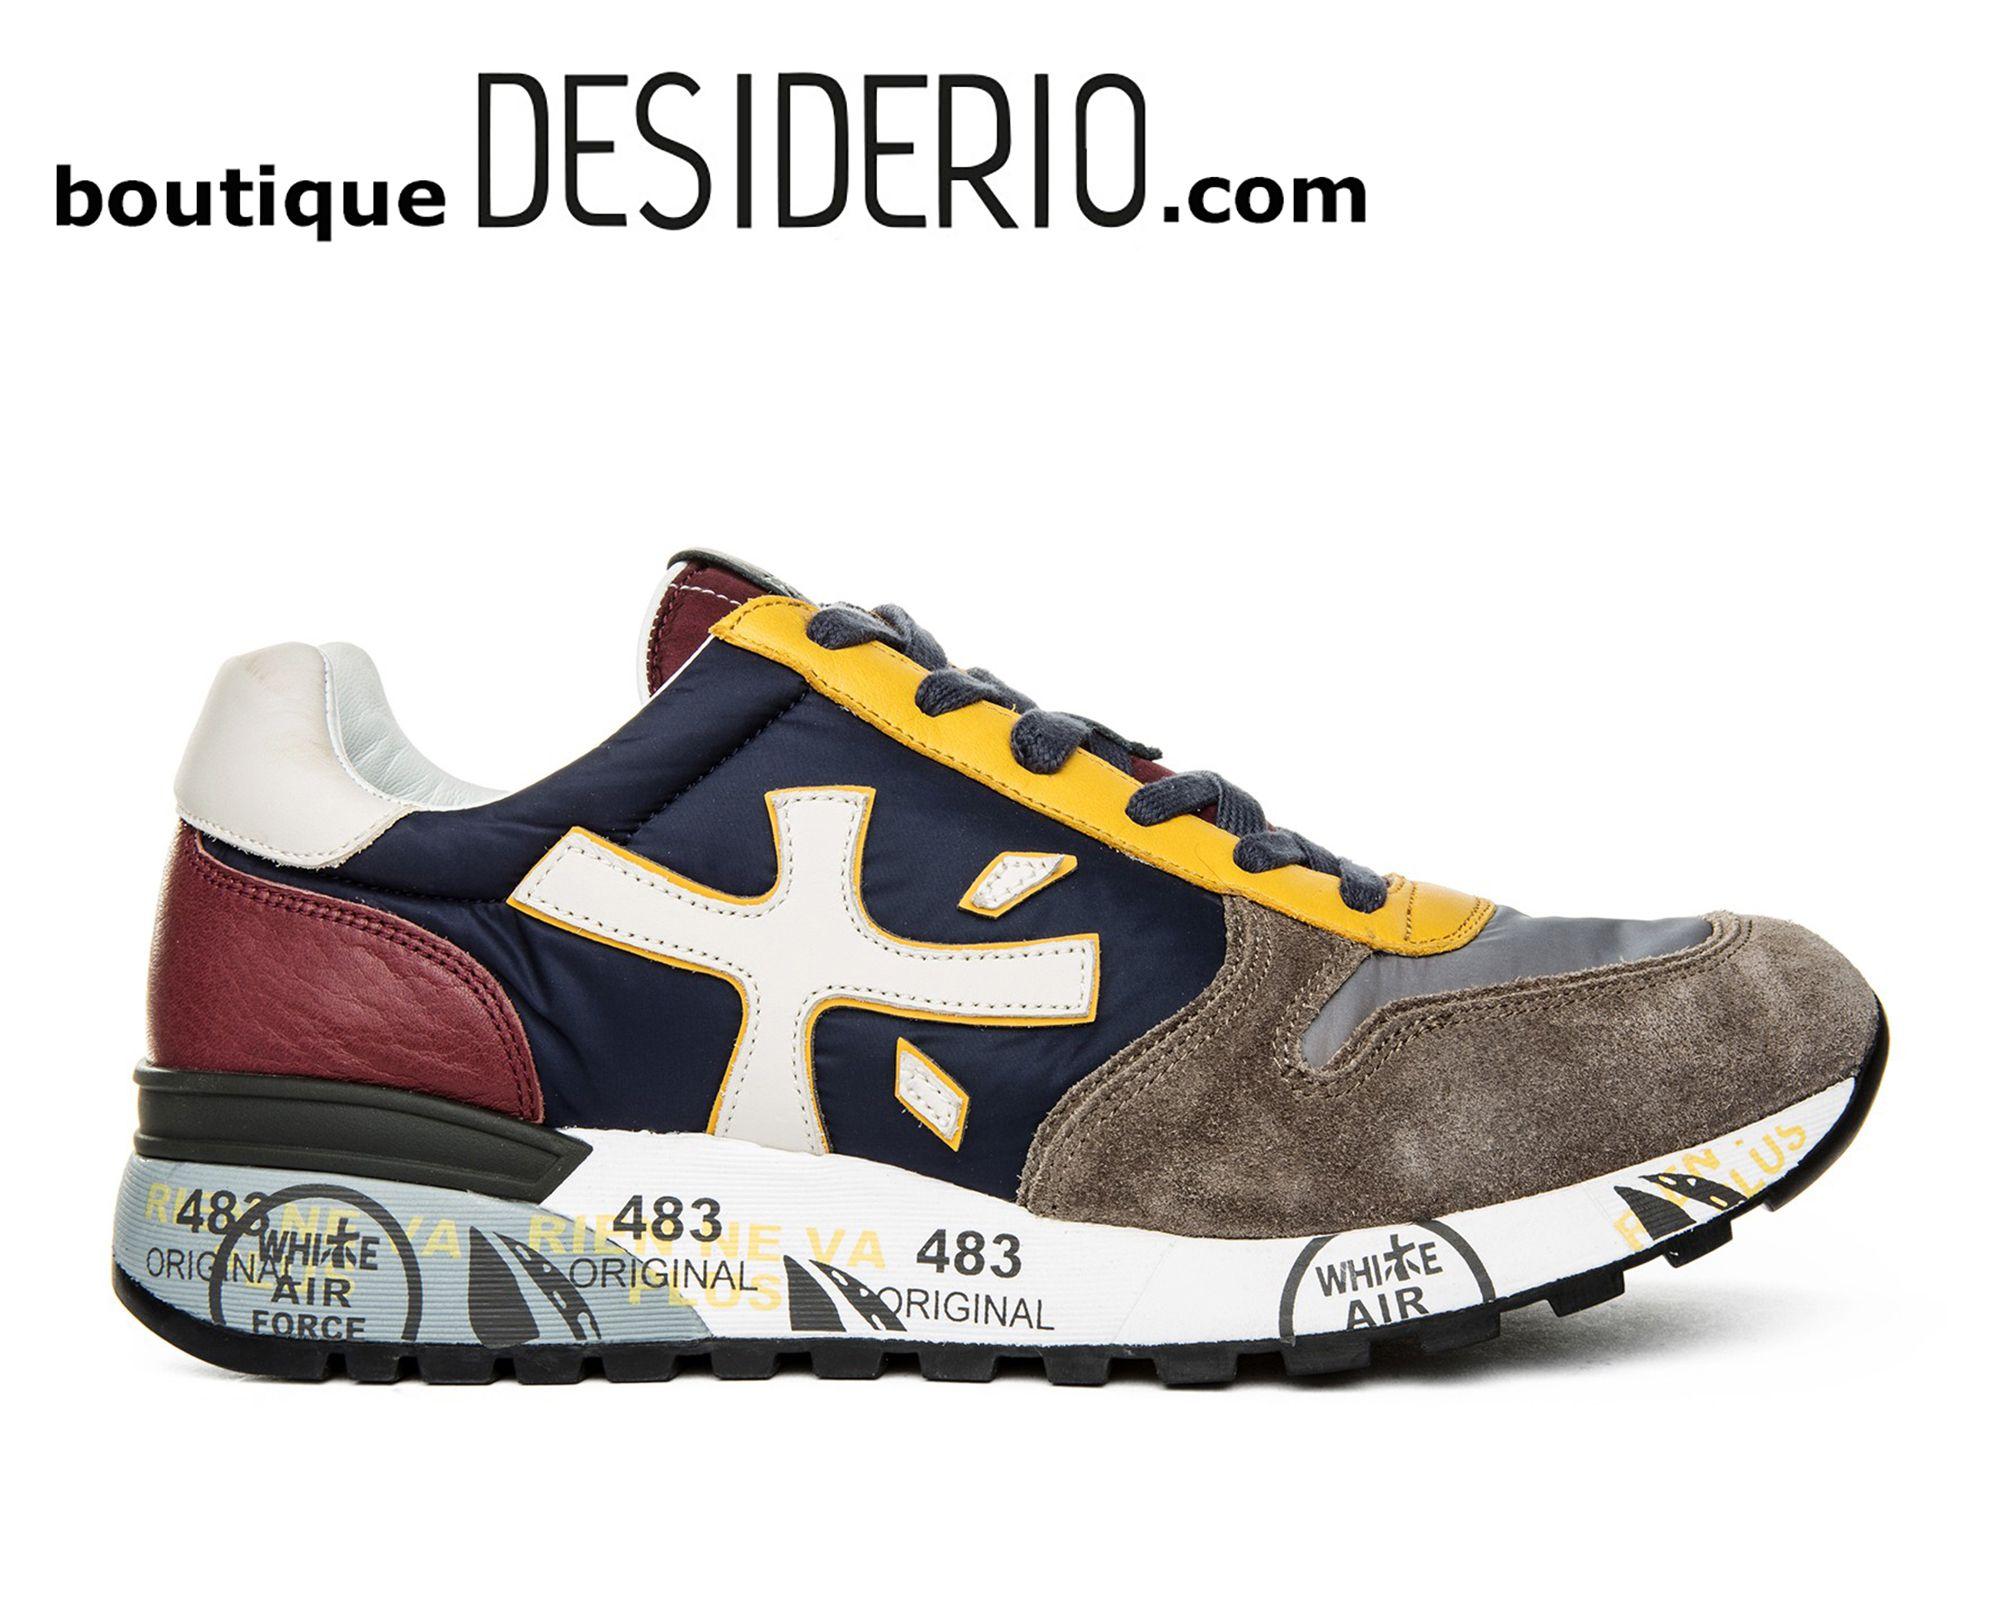 scarpe uomo new balance 2017 pelle